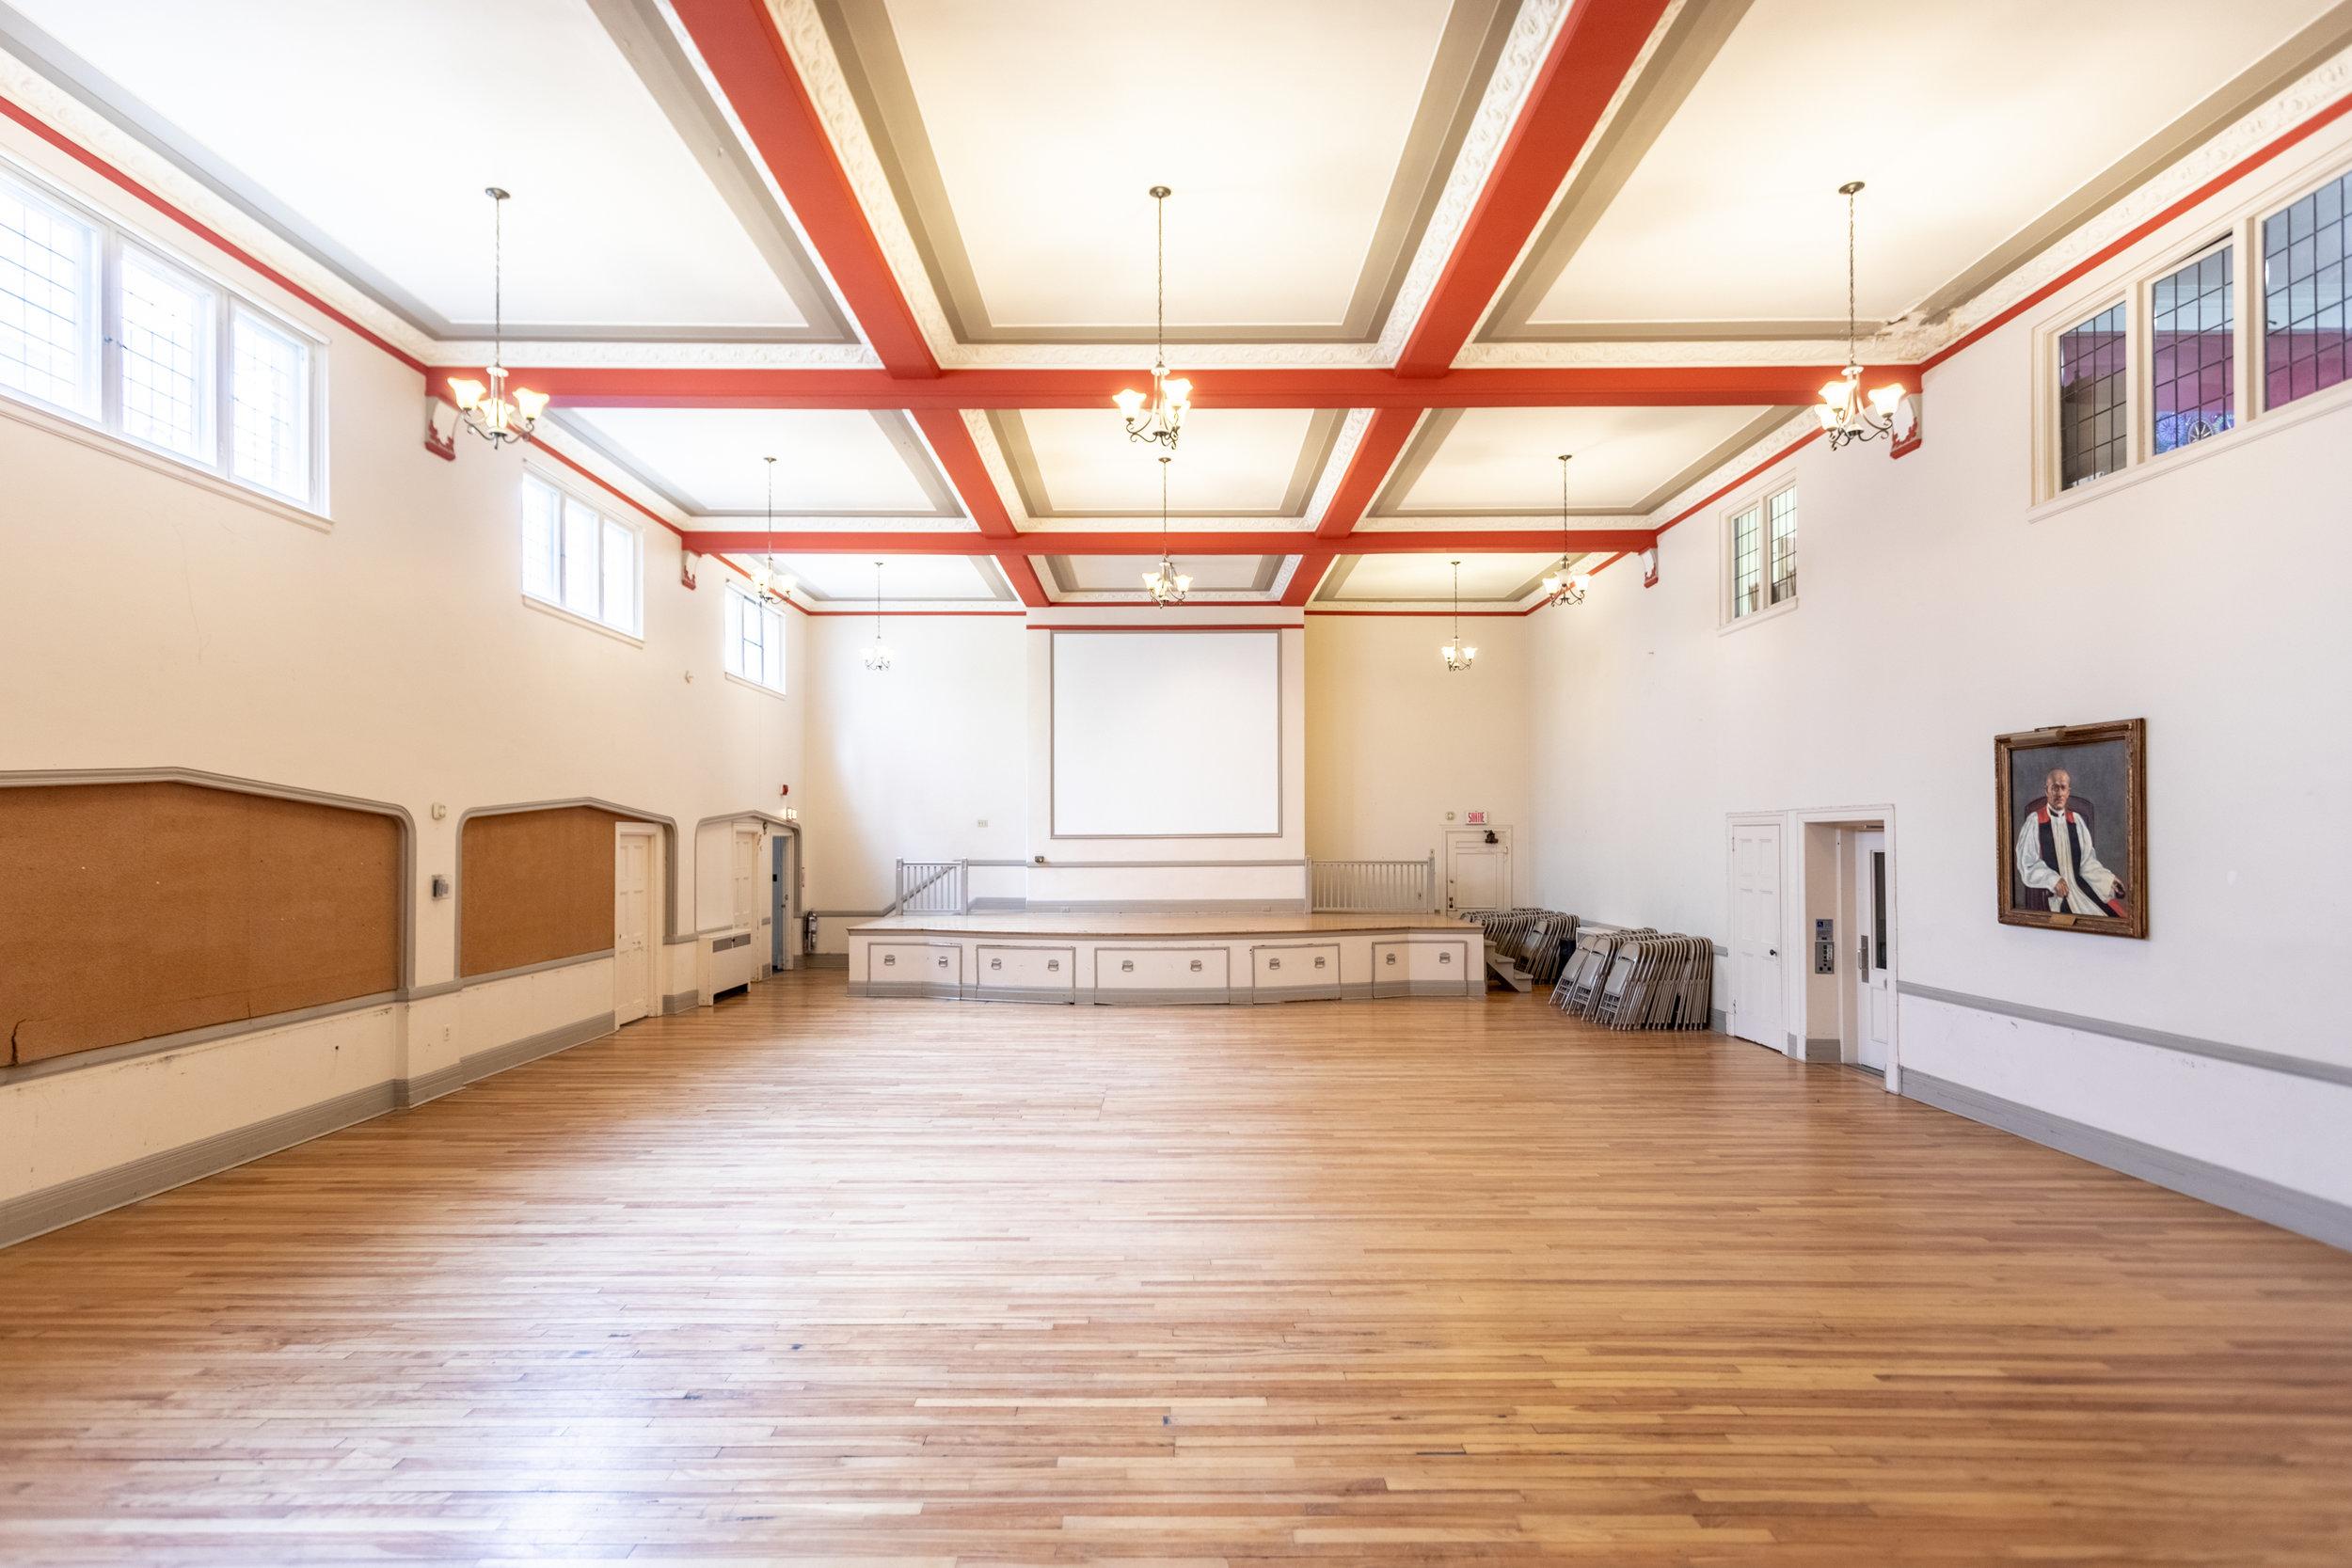 Shatford Hall